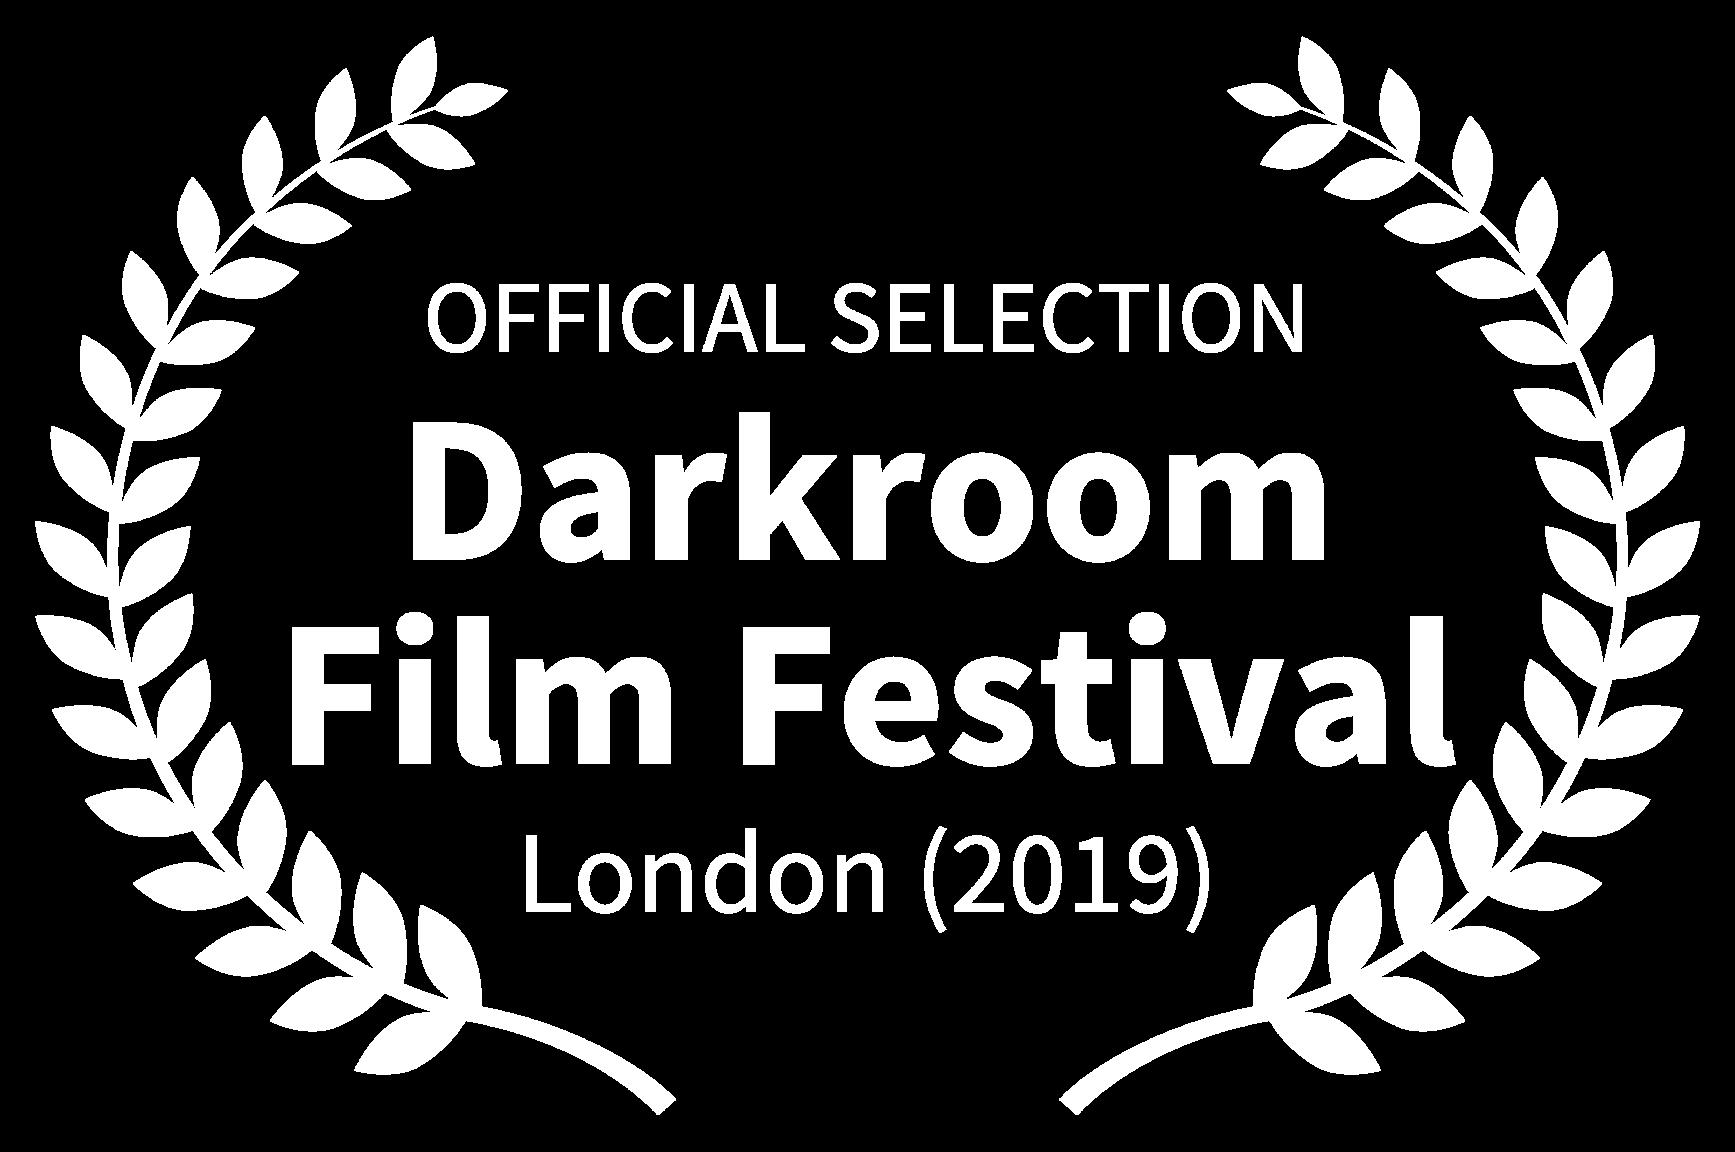 OFFICIAL SELECTION - Darkroom Film Festival - London 2019